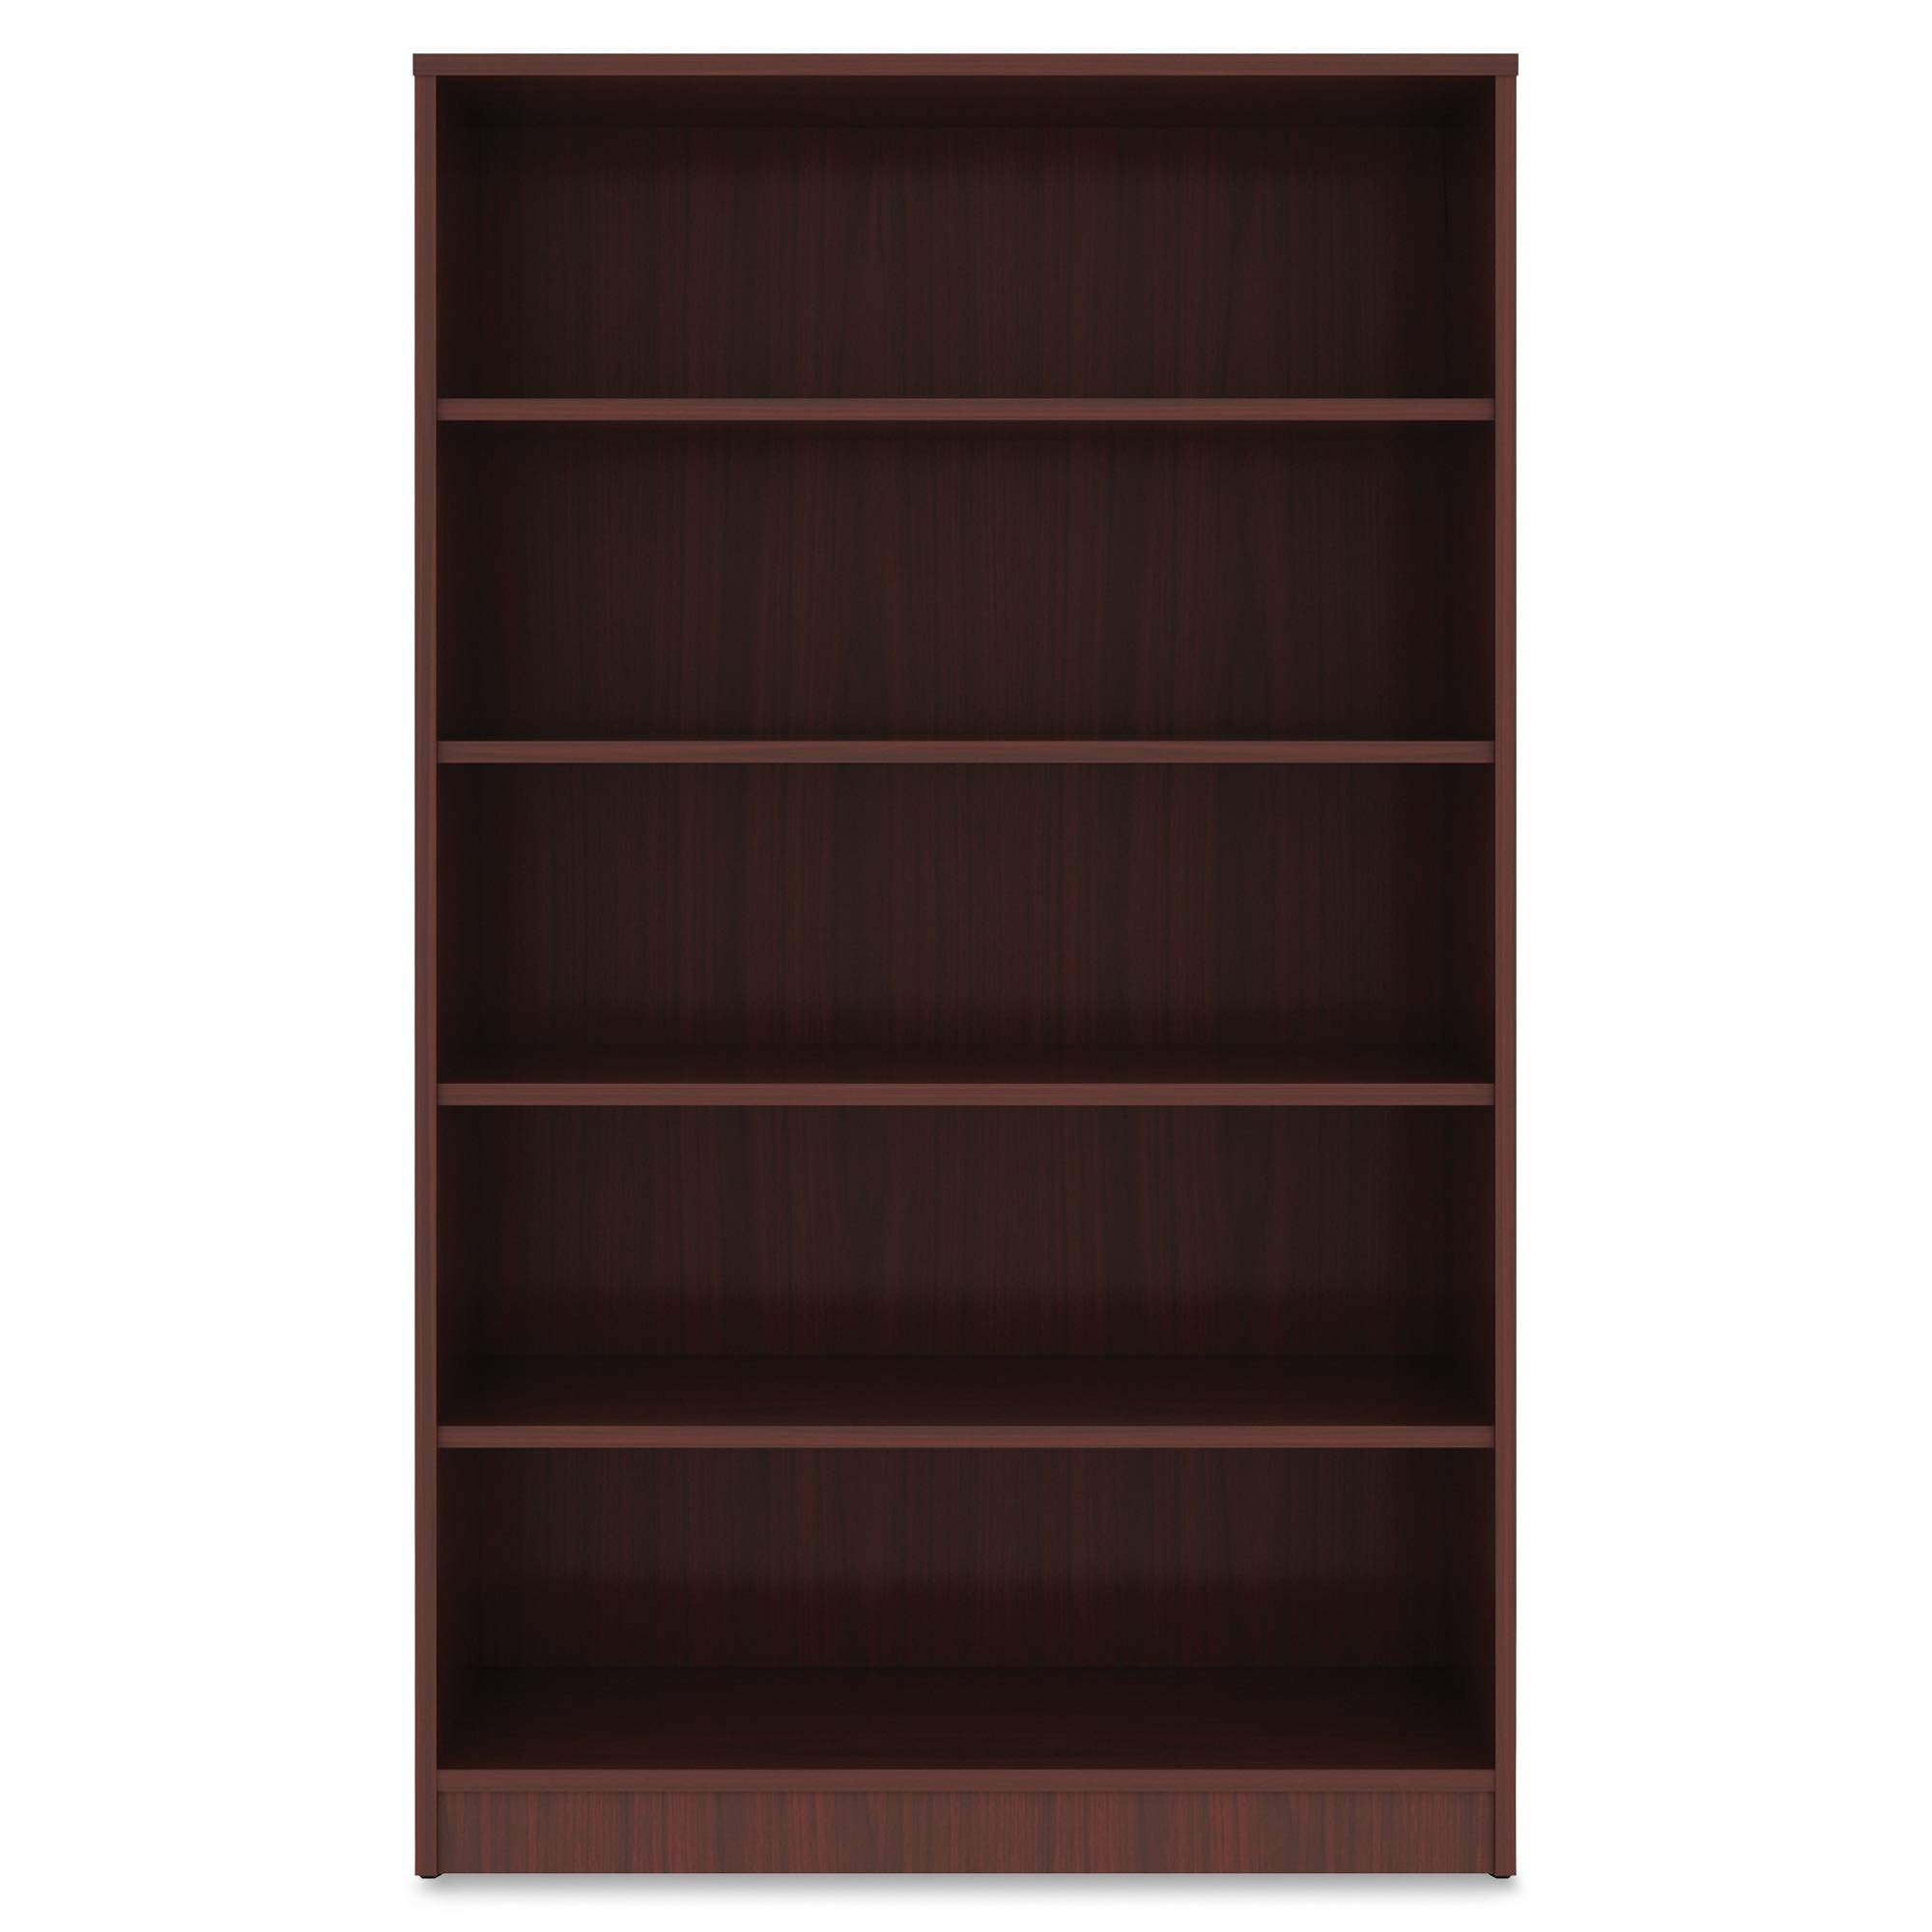 Lorell Bookshelf Bookcase, Mahogany